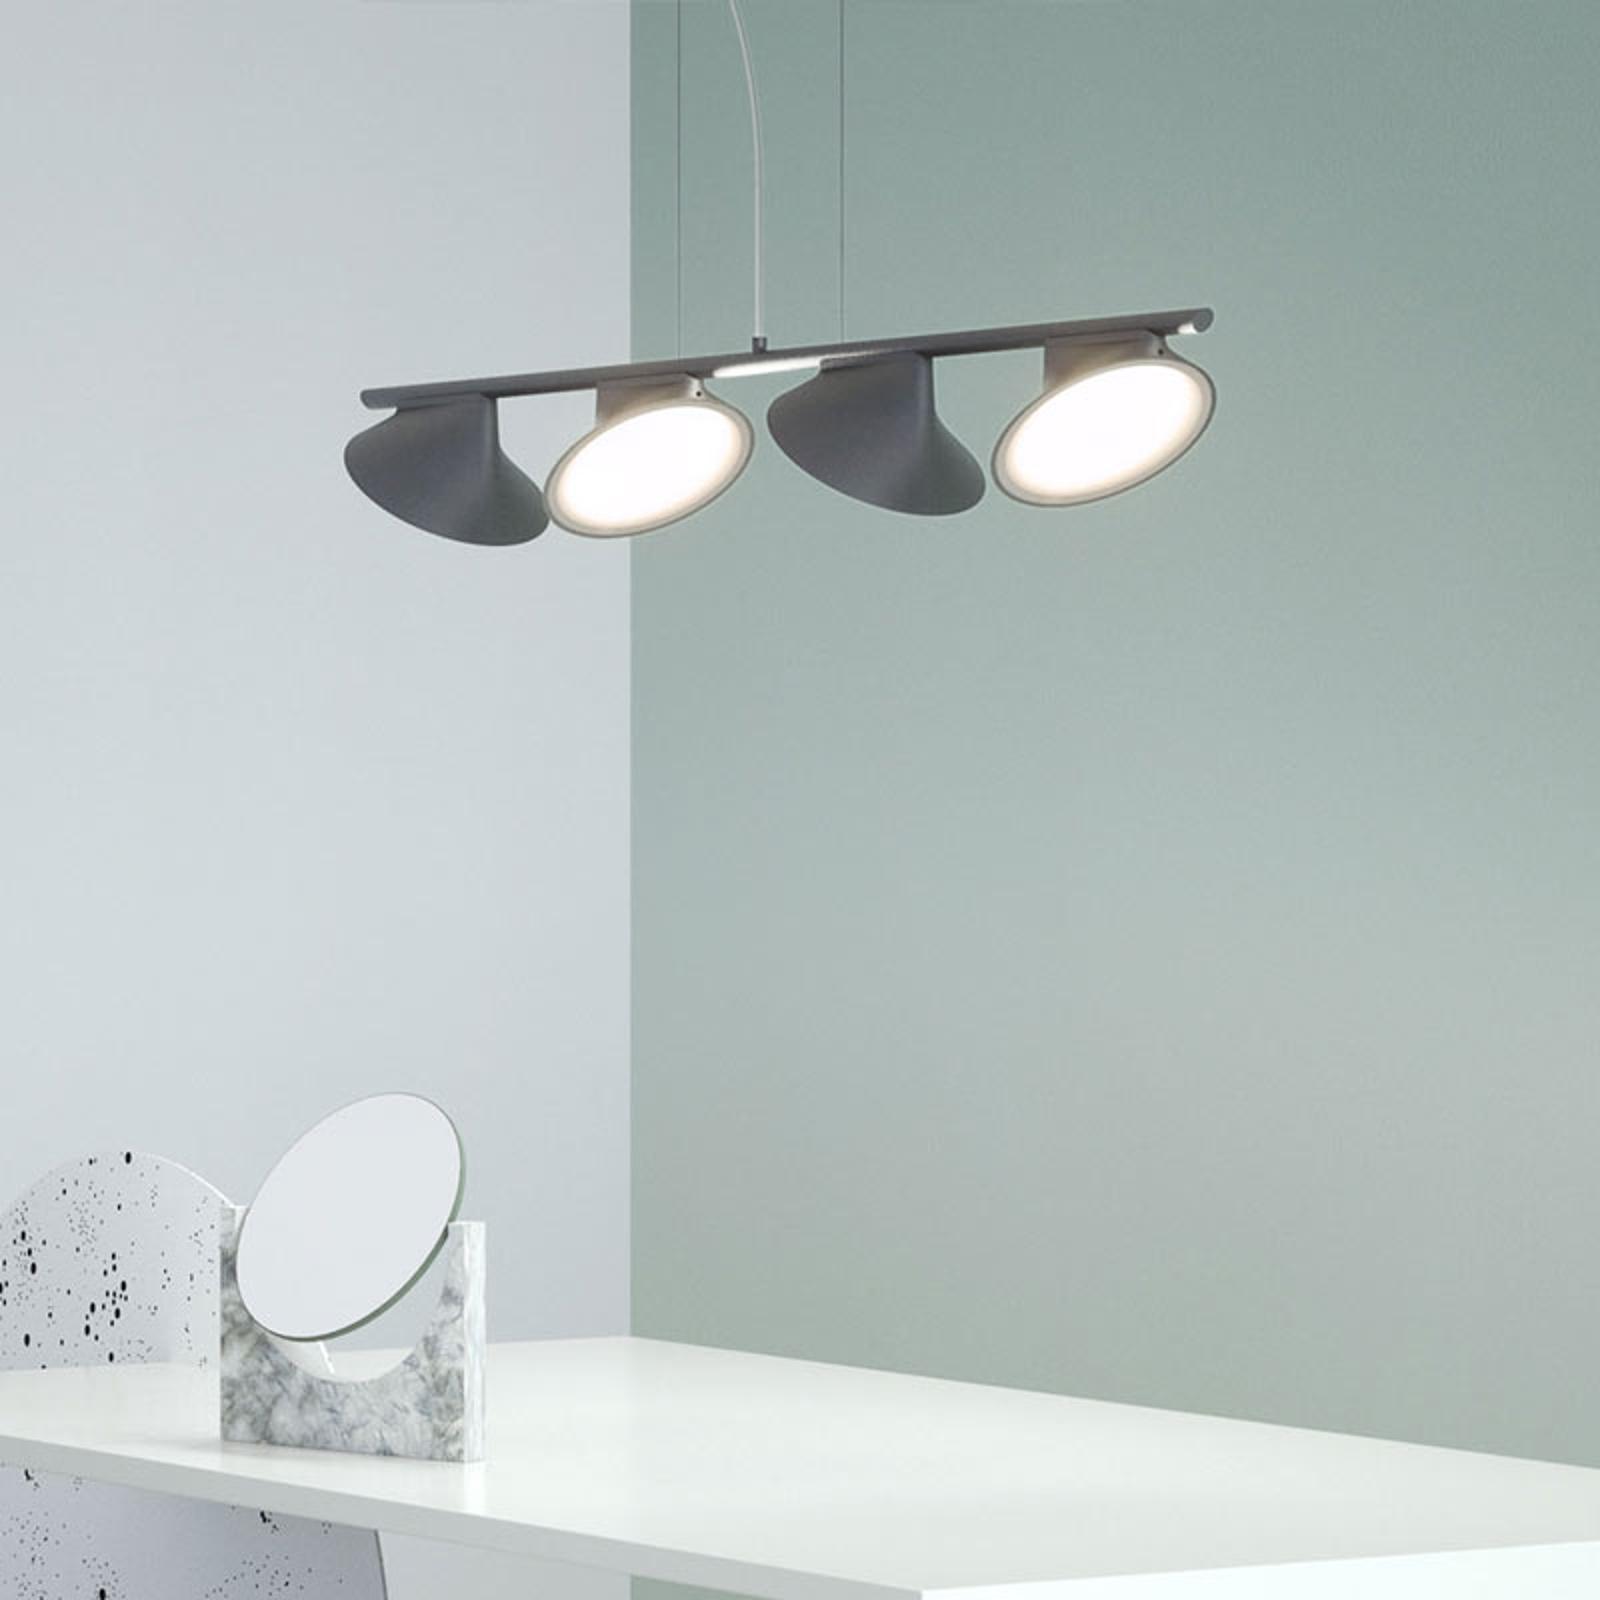 Axolight Orchid LED hanglamp 4-lamps grijs